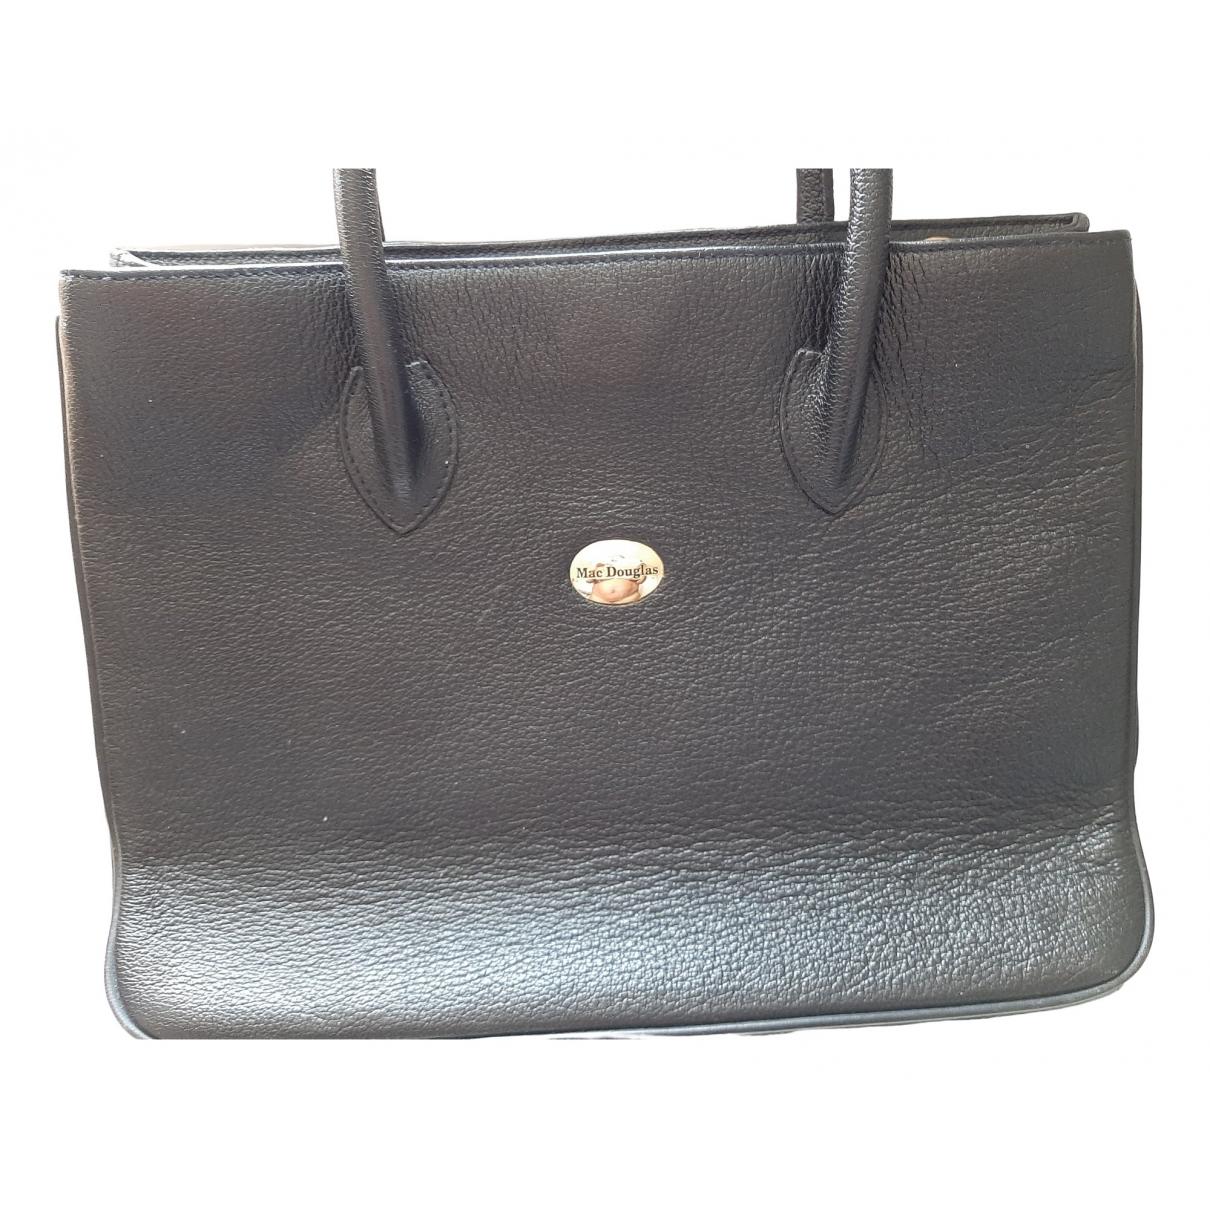 Mac Douglas \N Black Leather handbag for Women \N